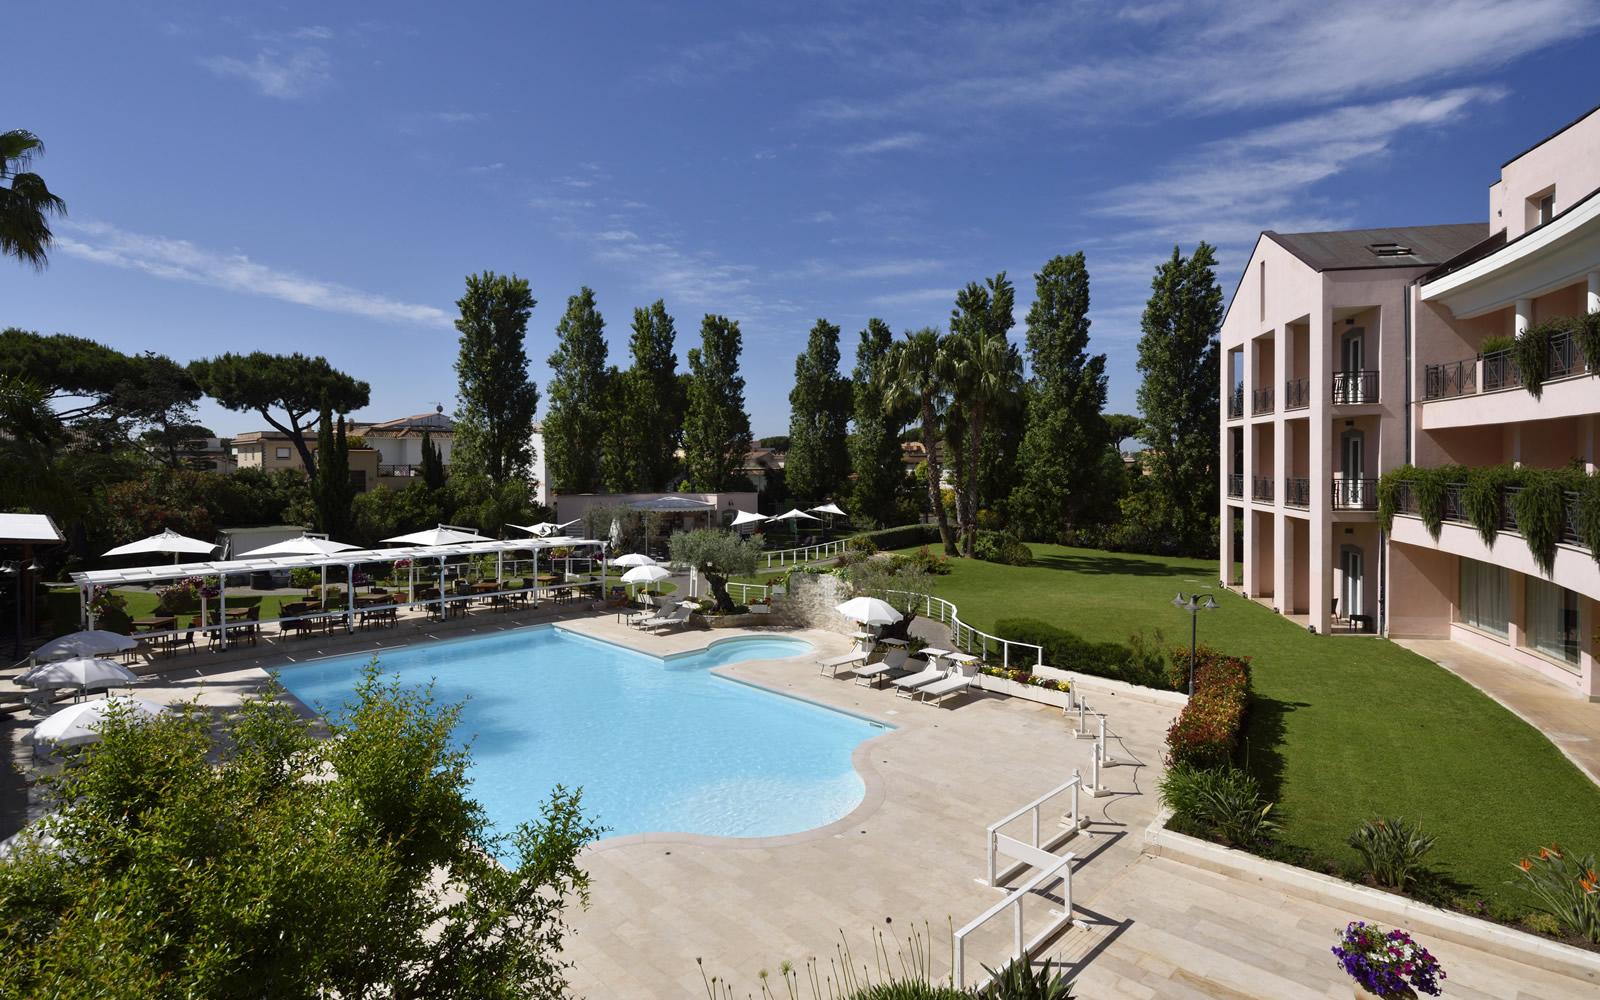 Hotel Isola Sacra Rome Airport - Hôtel Avec Piscine concernant Hotel Rome Avec Piscine